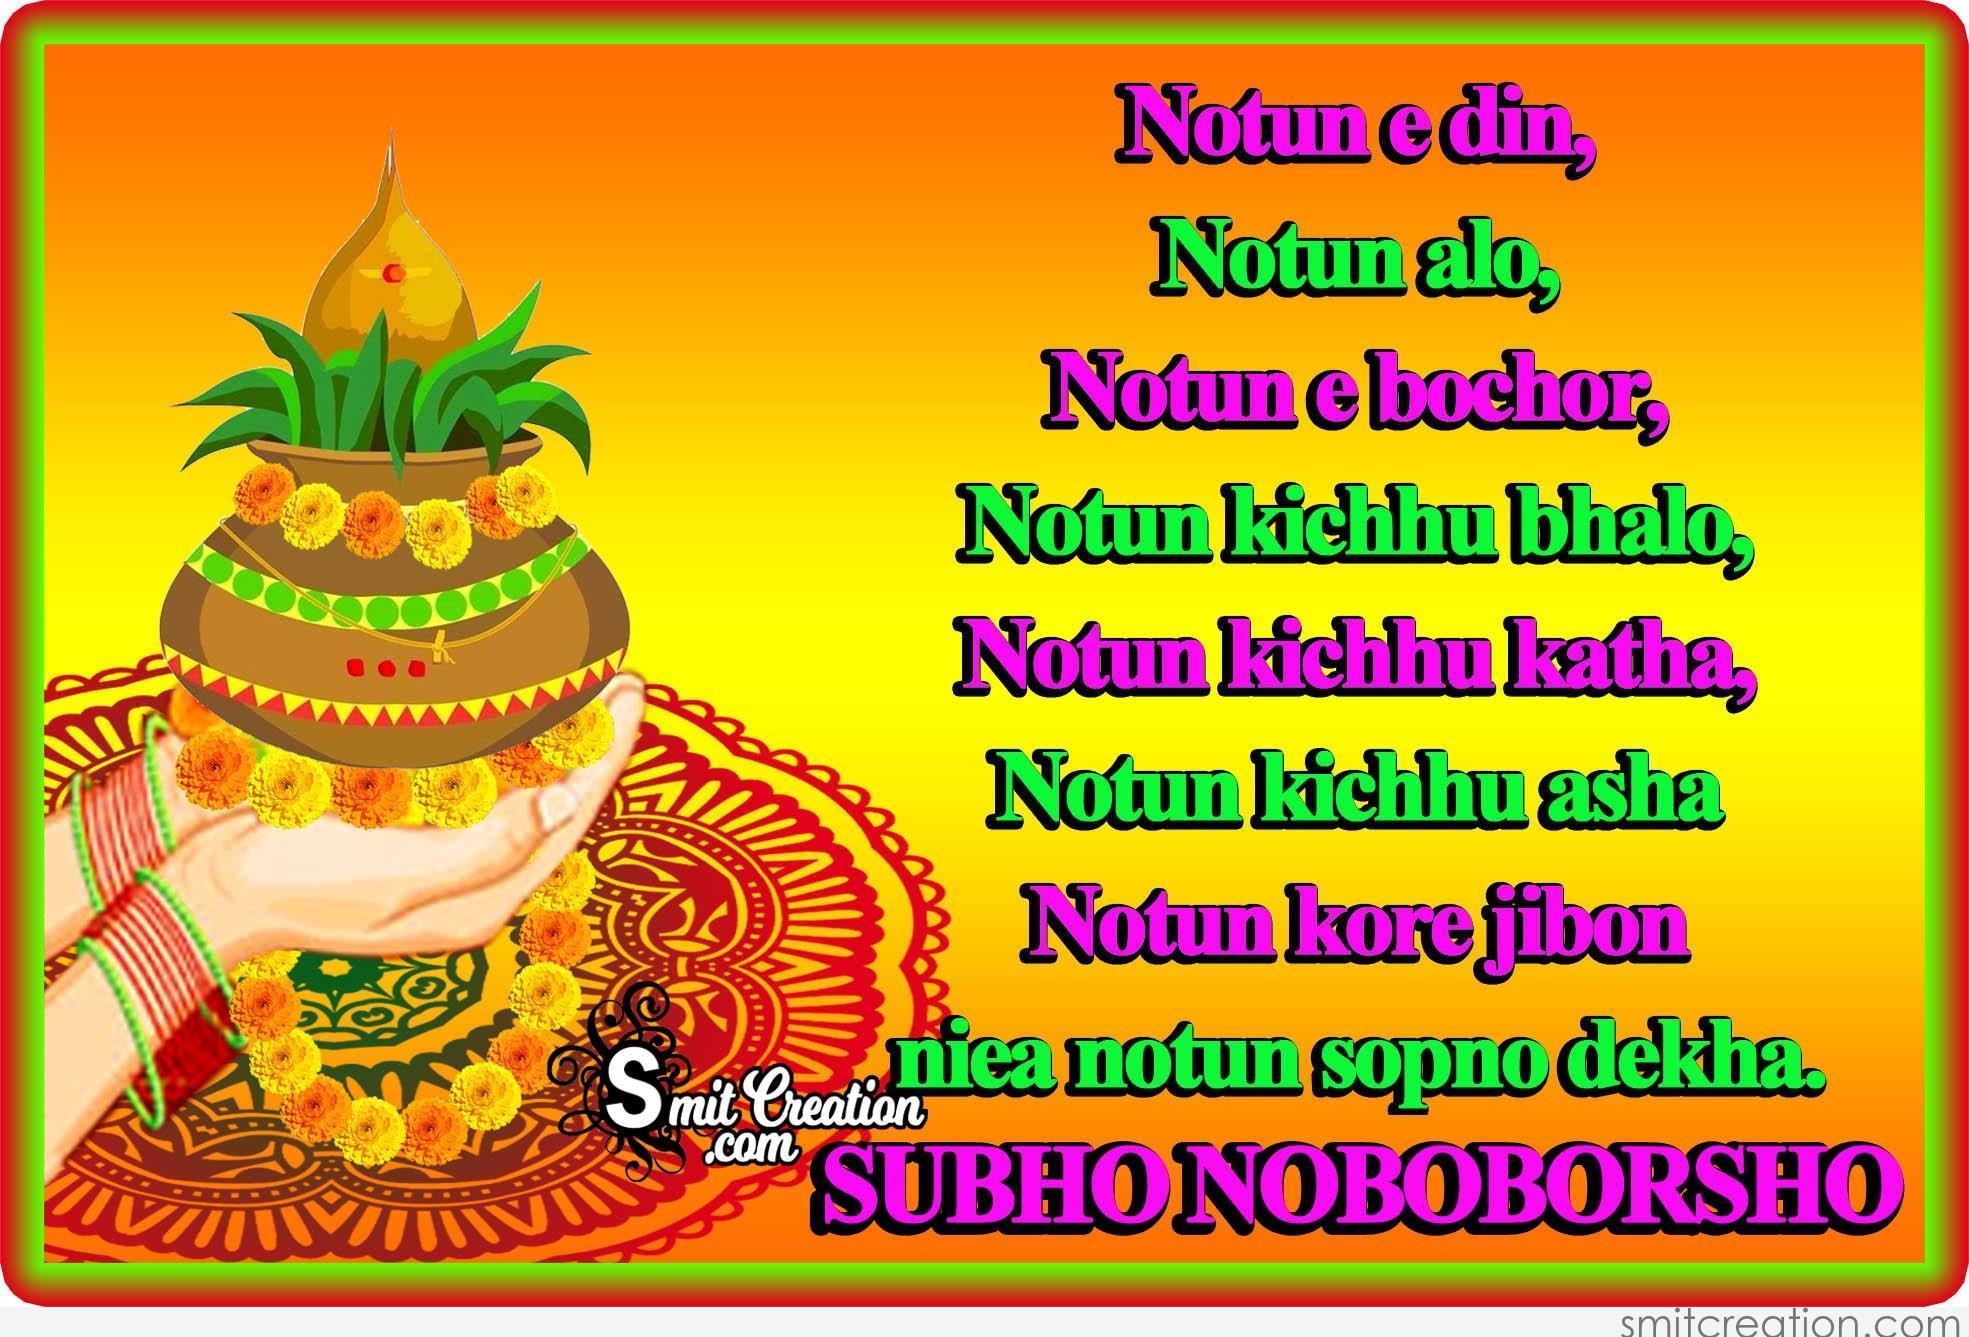 Subho noboborsho bengali new year greetings smitcreation notun e din notun alo notun e bochor notun kichhu bhalo notun kichhu katha notun kichhu asha notun kore jibon niea notun sopno dekha subho noboborsho m4hsunfo